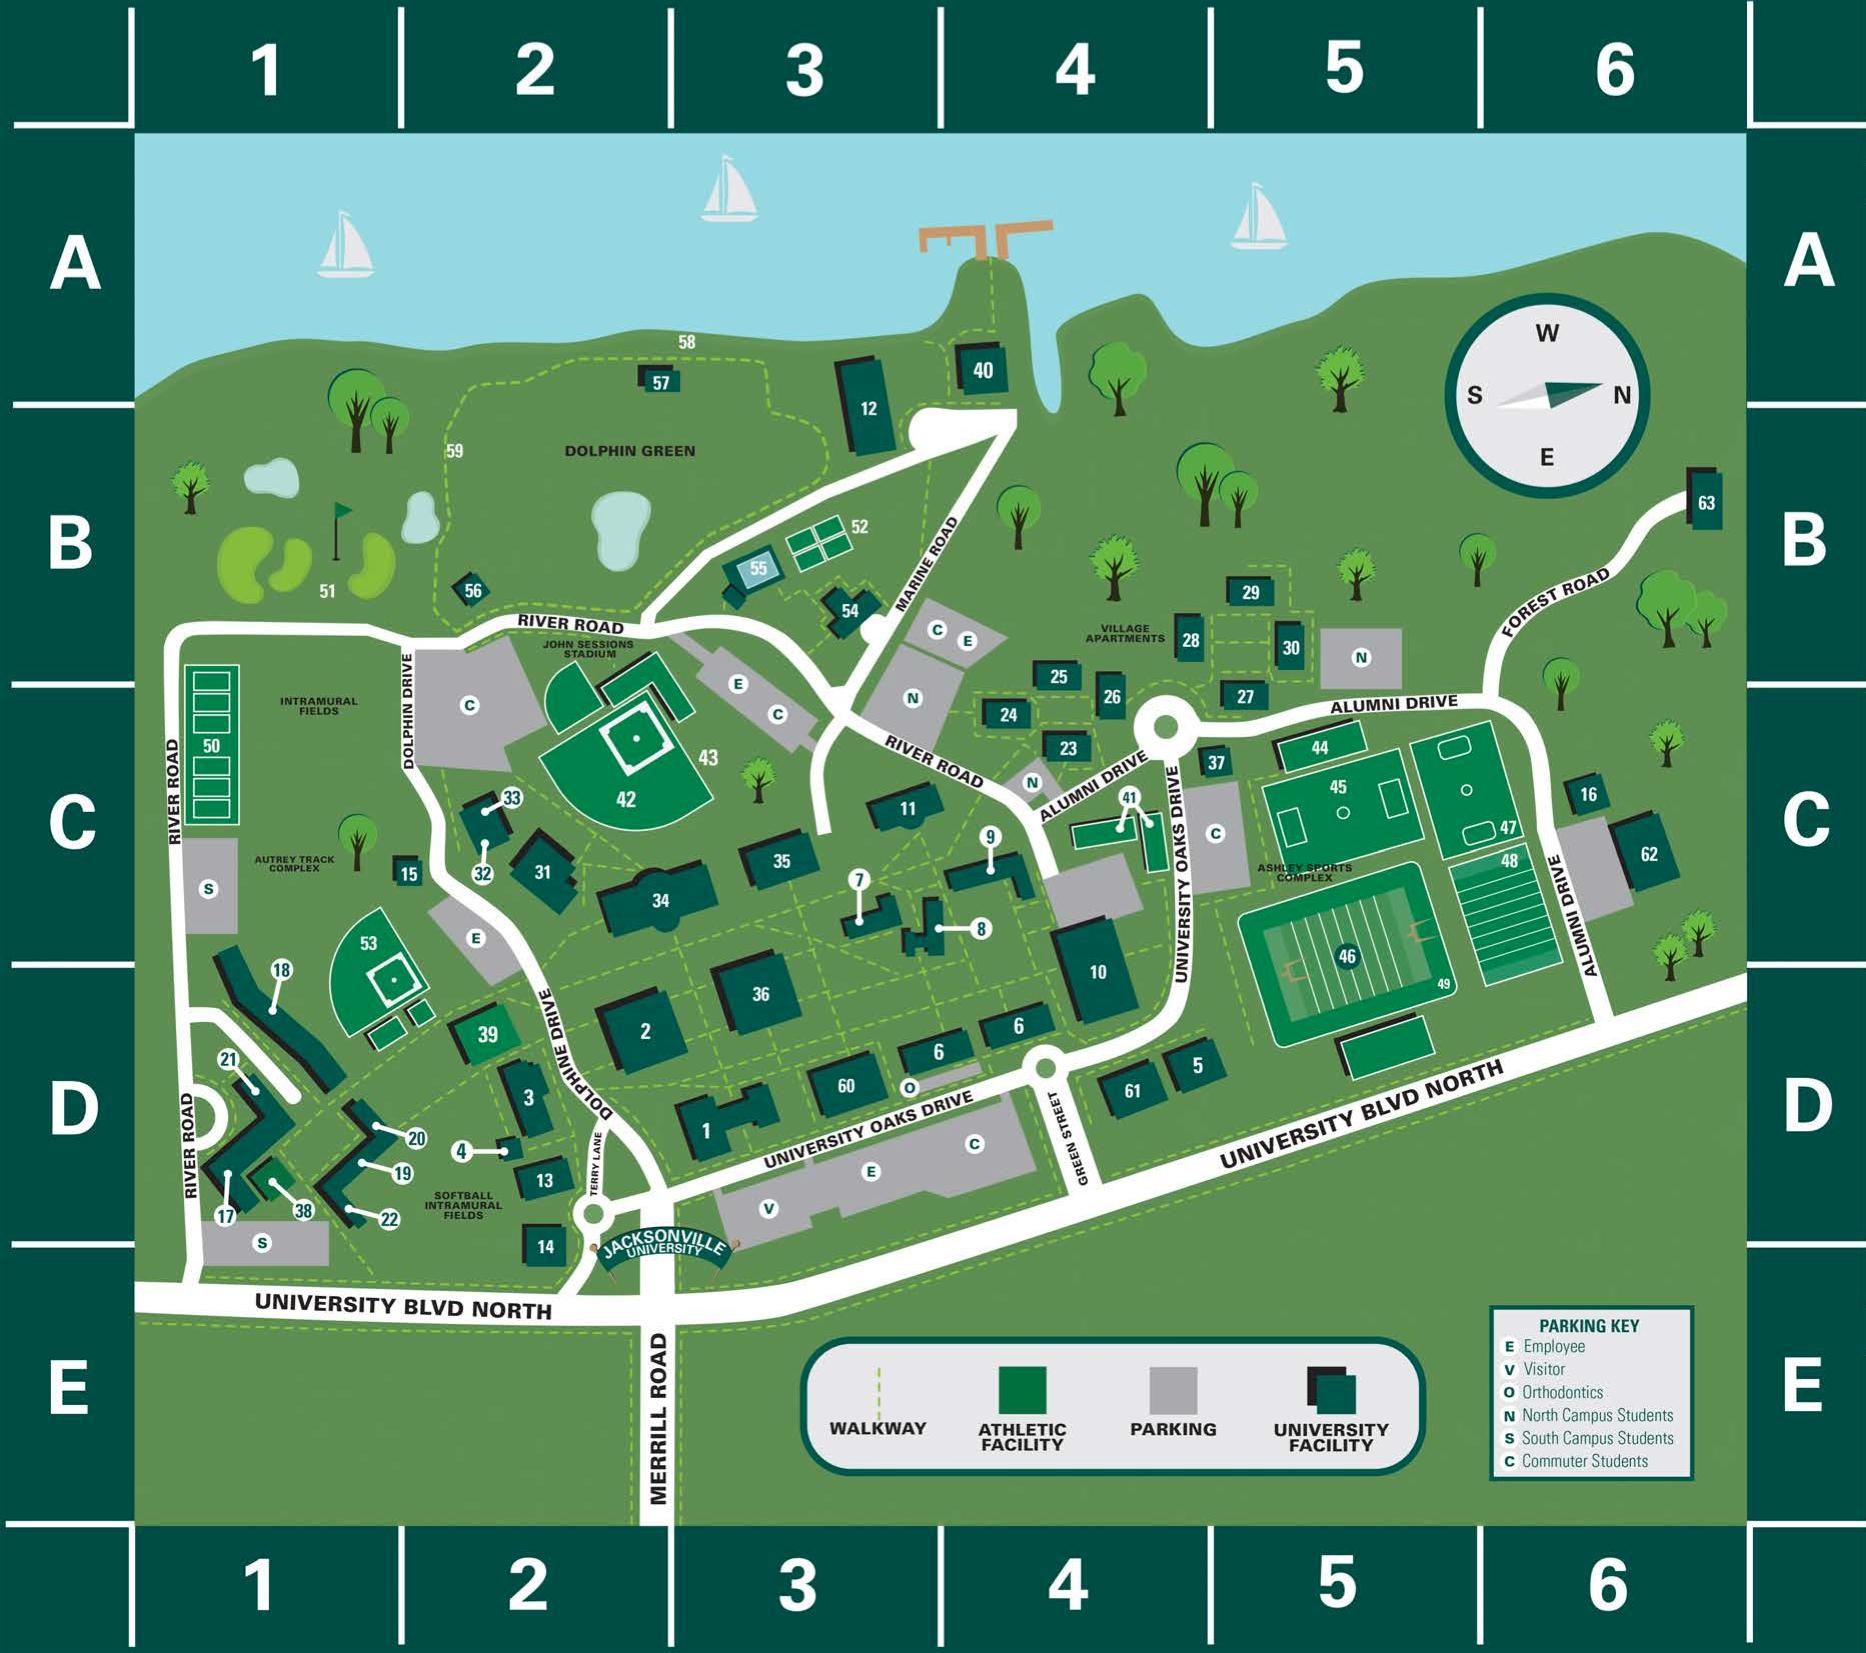 jacksonville university campus map Https Www Ju Edu Index 37907 Php Https Www Ju Edu Index Php jacksonville university campus map